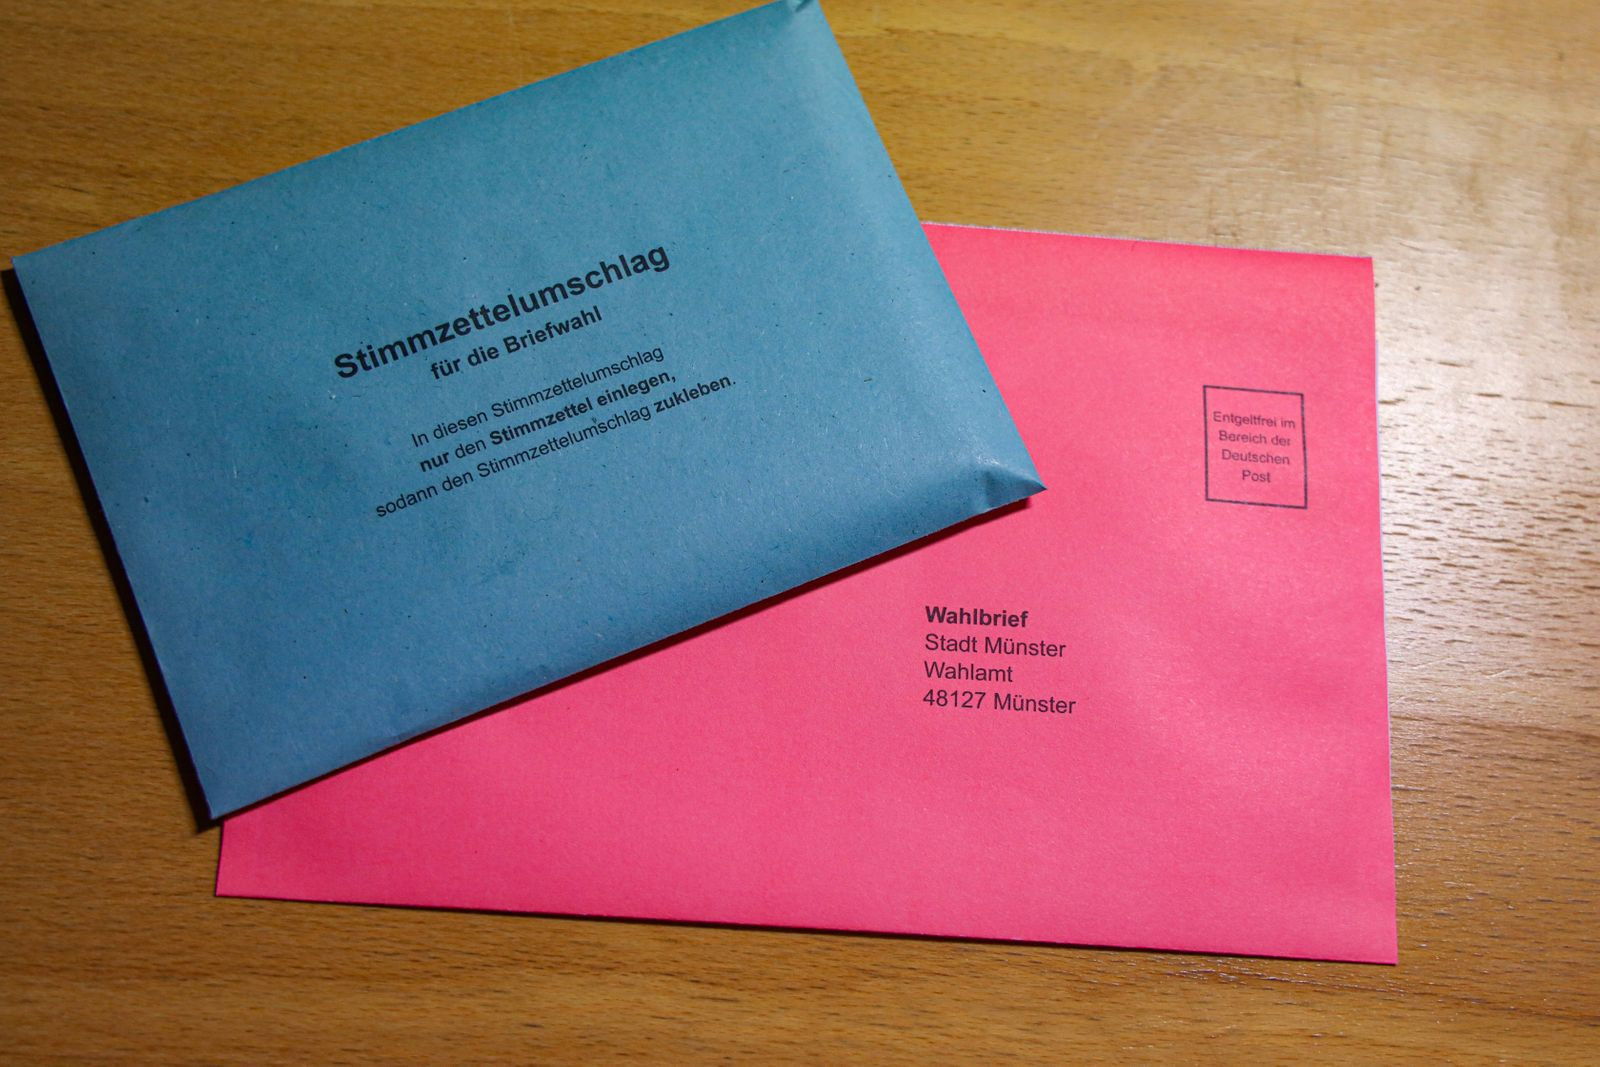 Briefwahl - Stimmzettelumschlag / Wahlbrief *** Postal vote Ballot paper envelope Ballot letter